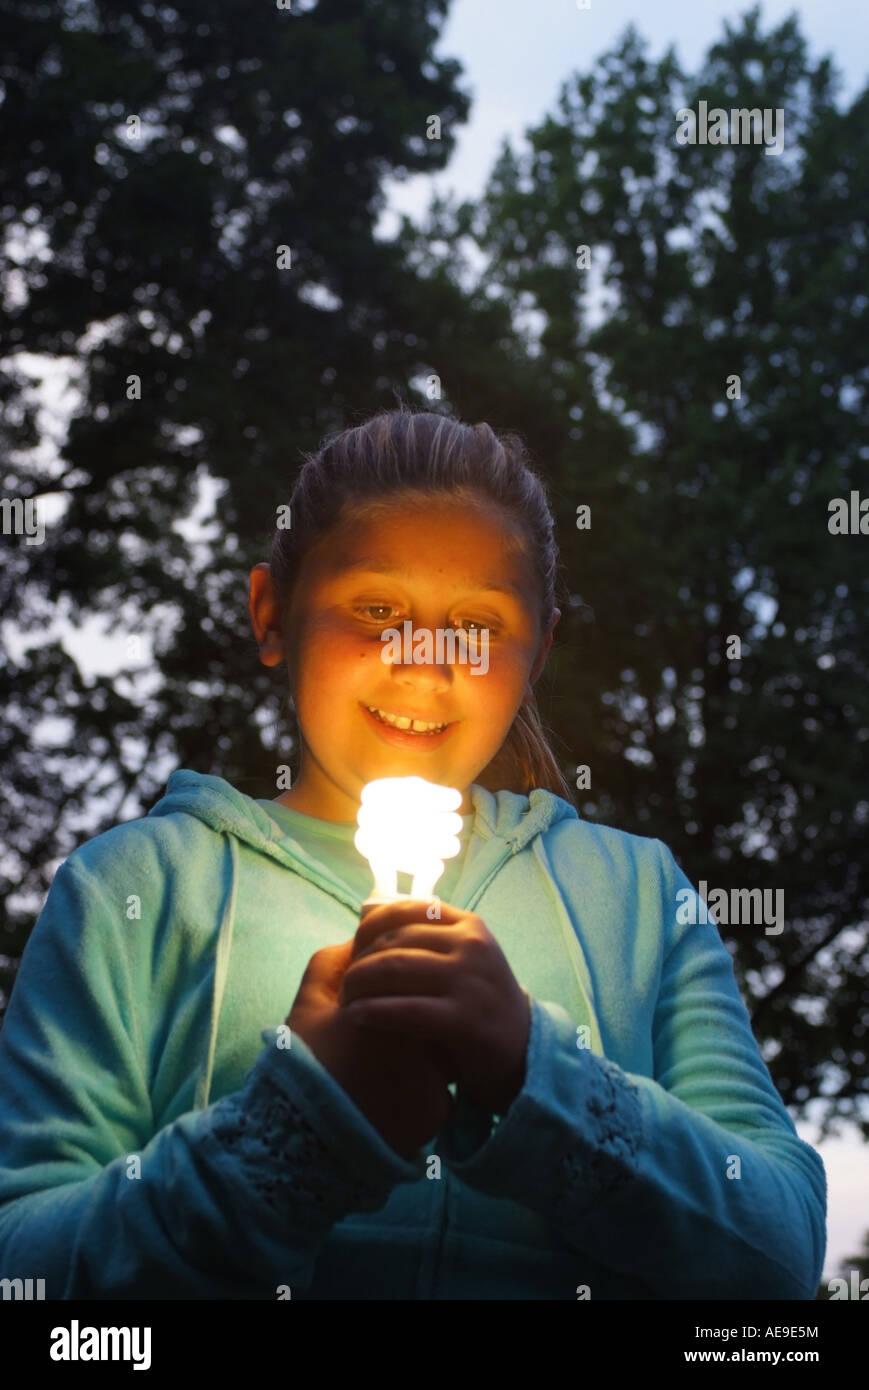 girl-holding-a-fluorescent-energy-saver-